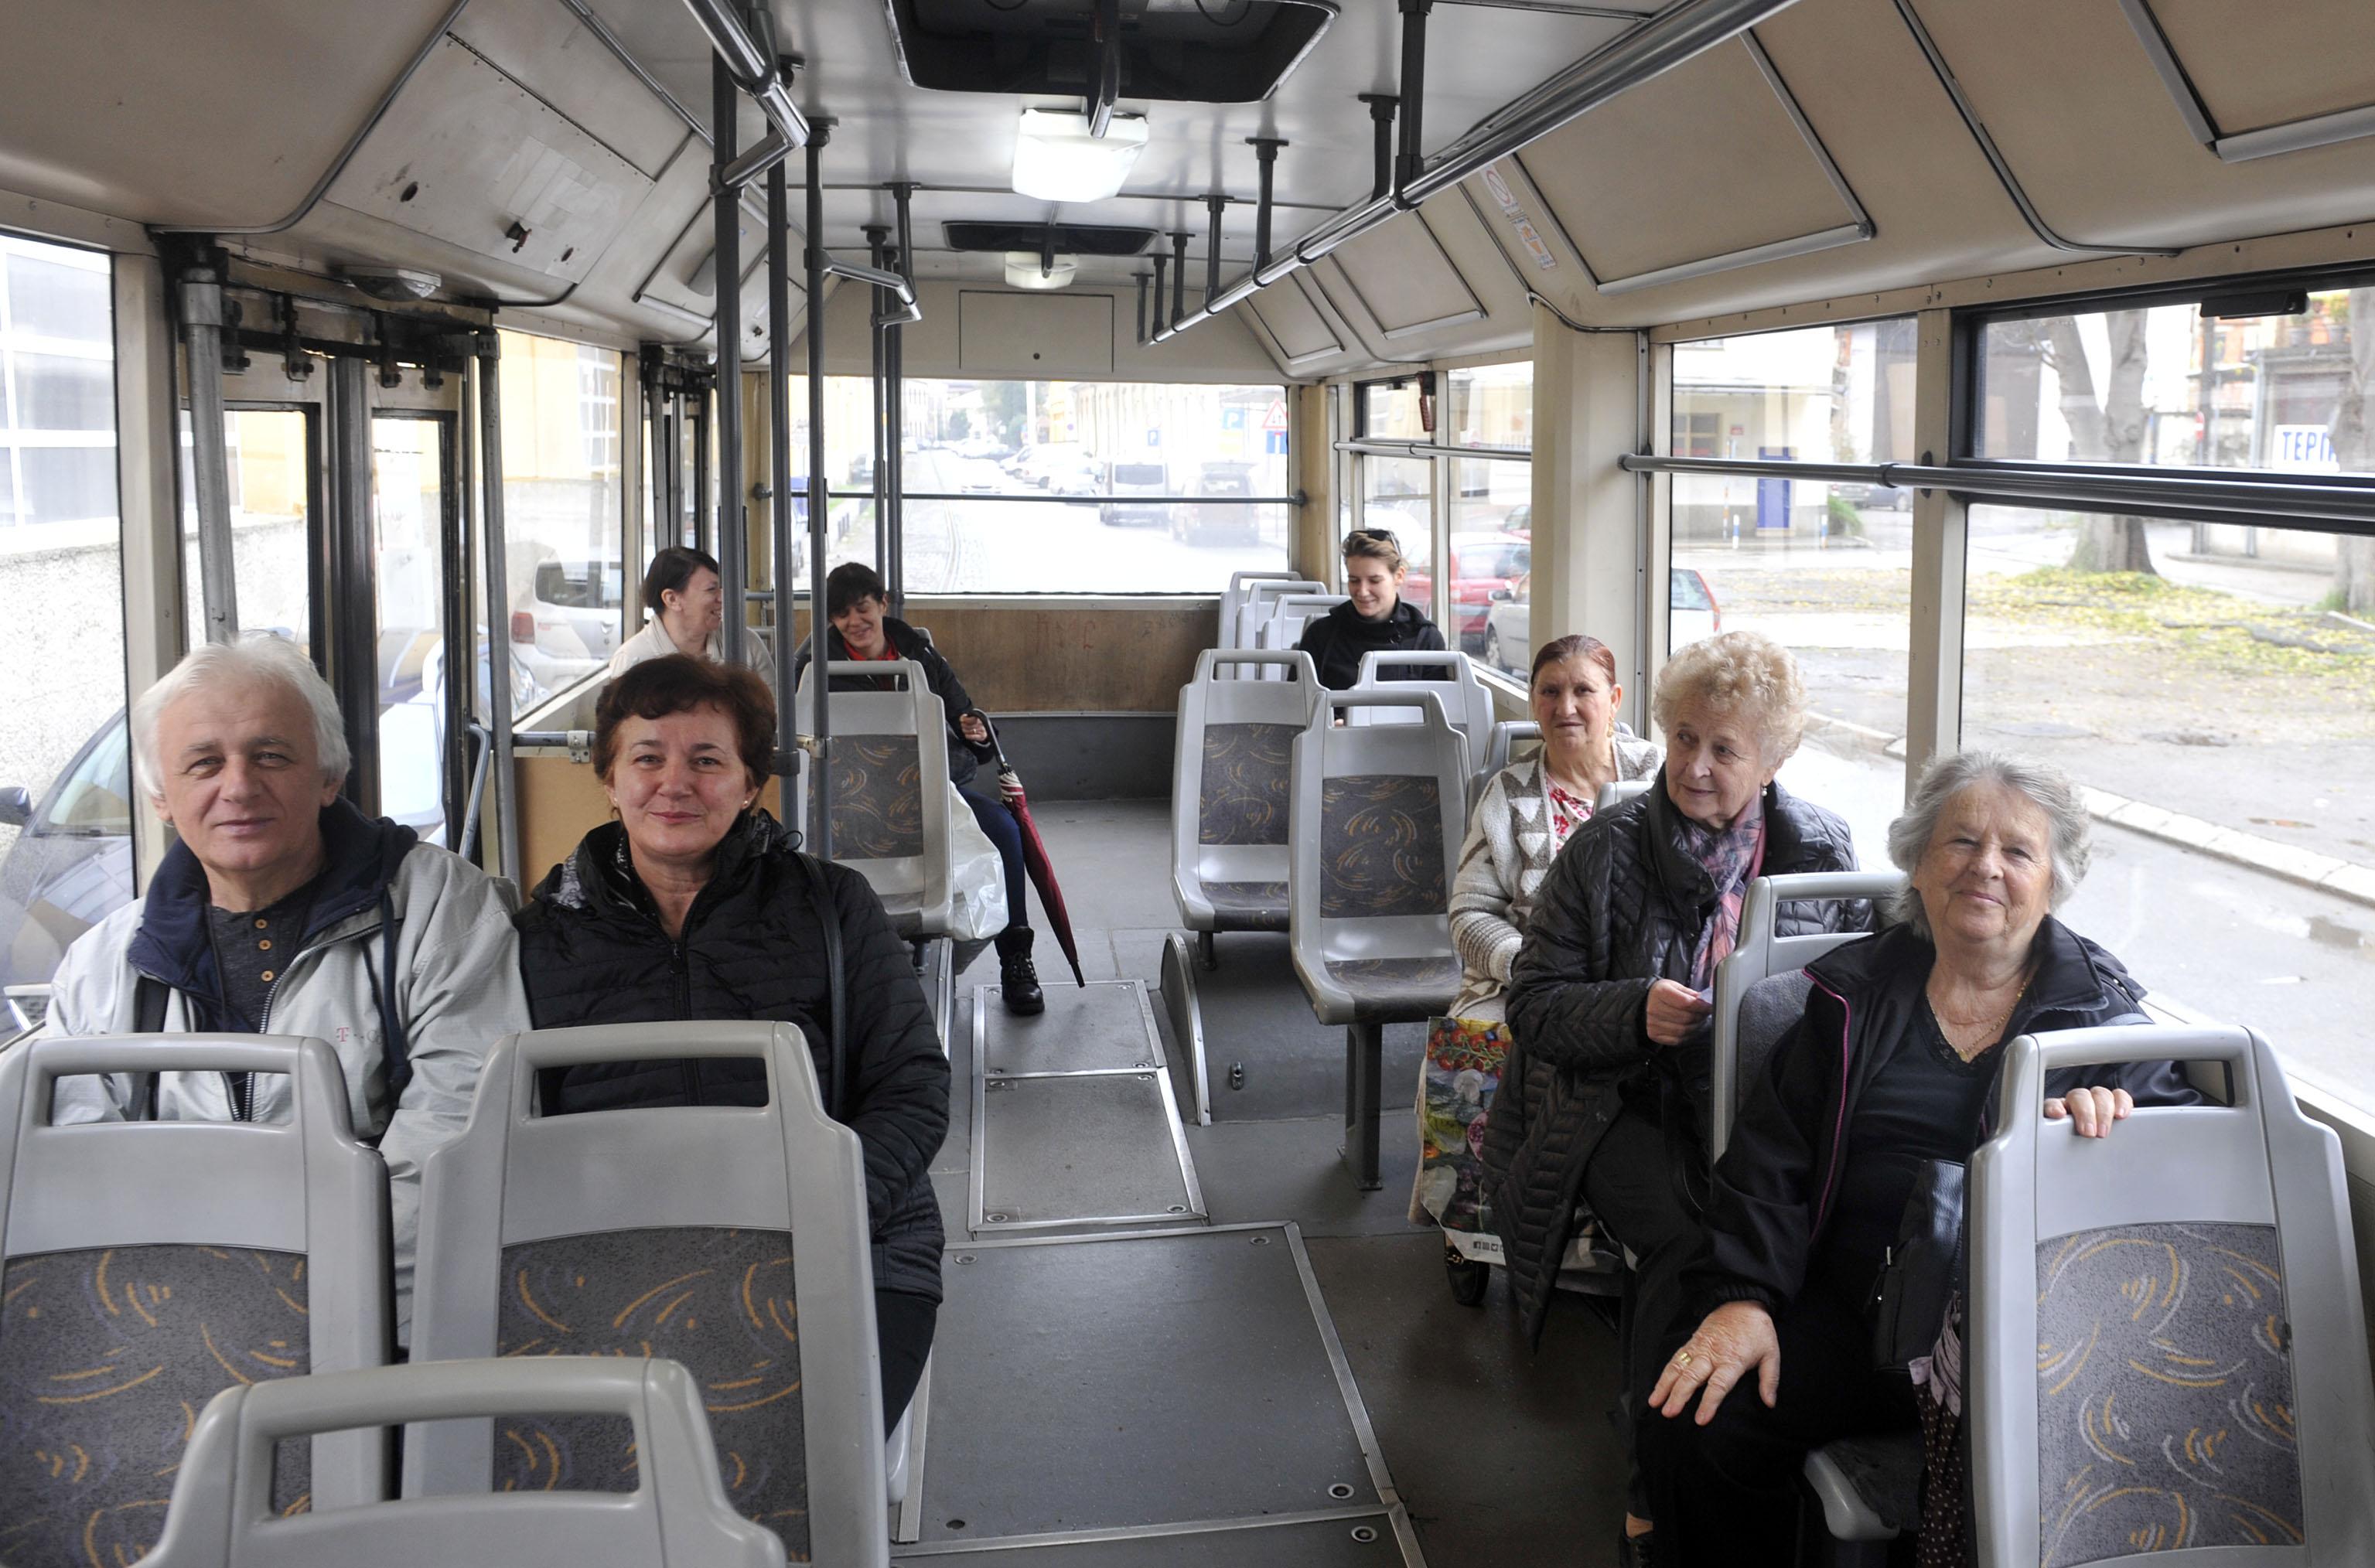 : Putnike ugodno iznenadila mlada vozačica u »osmici« / Foto Vedran KARUZA